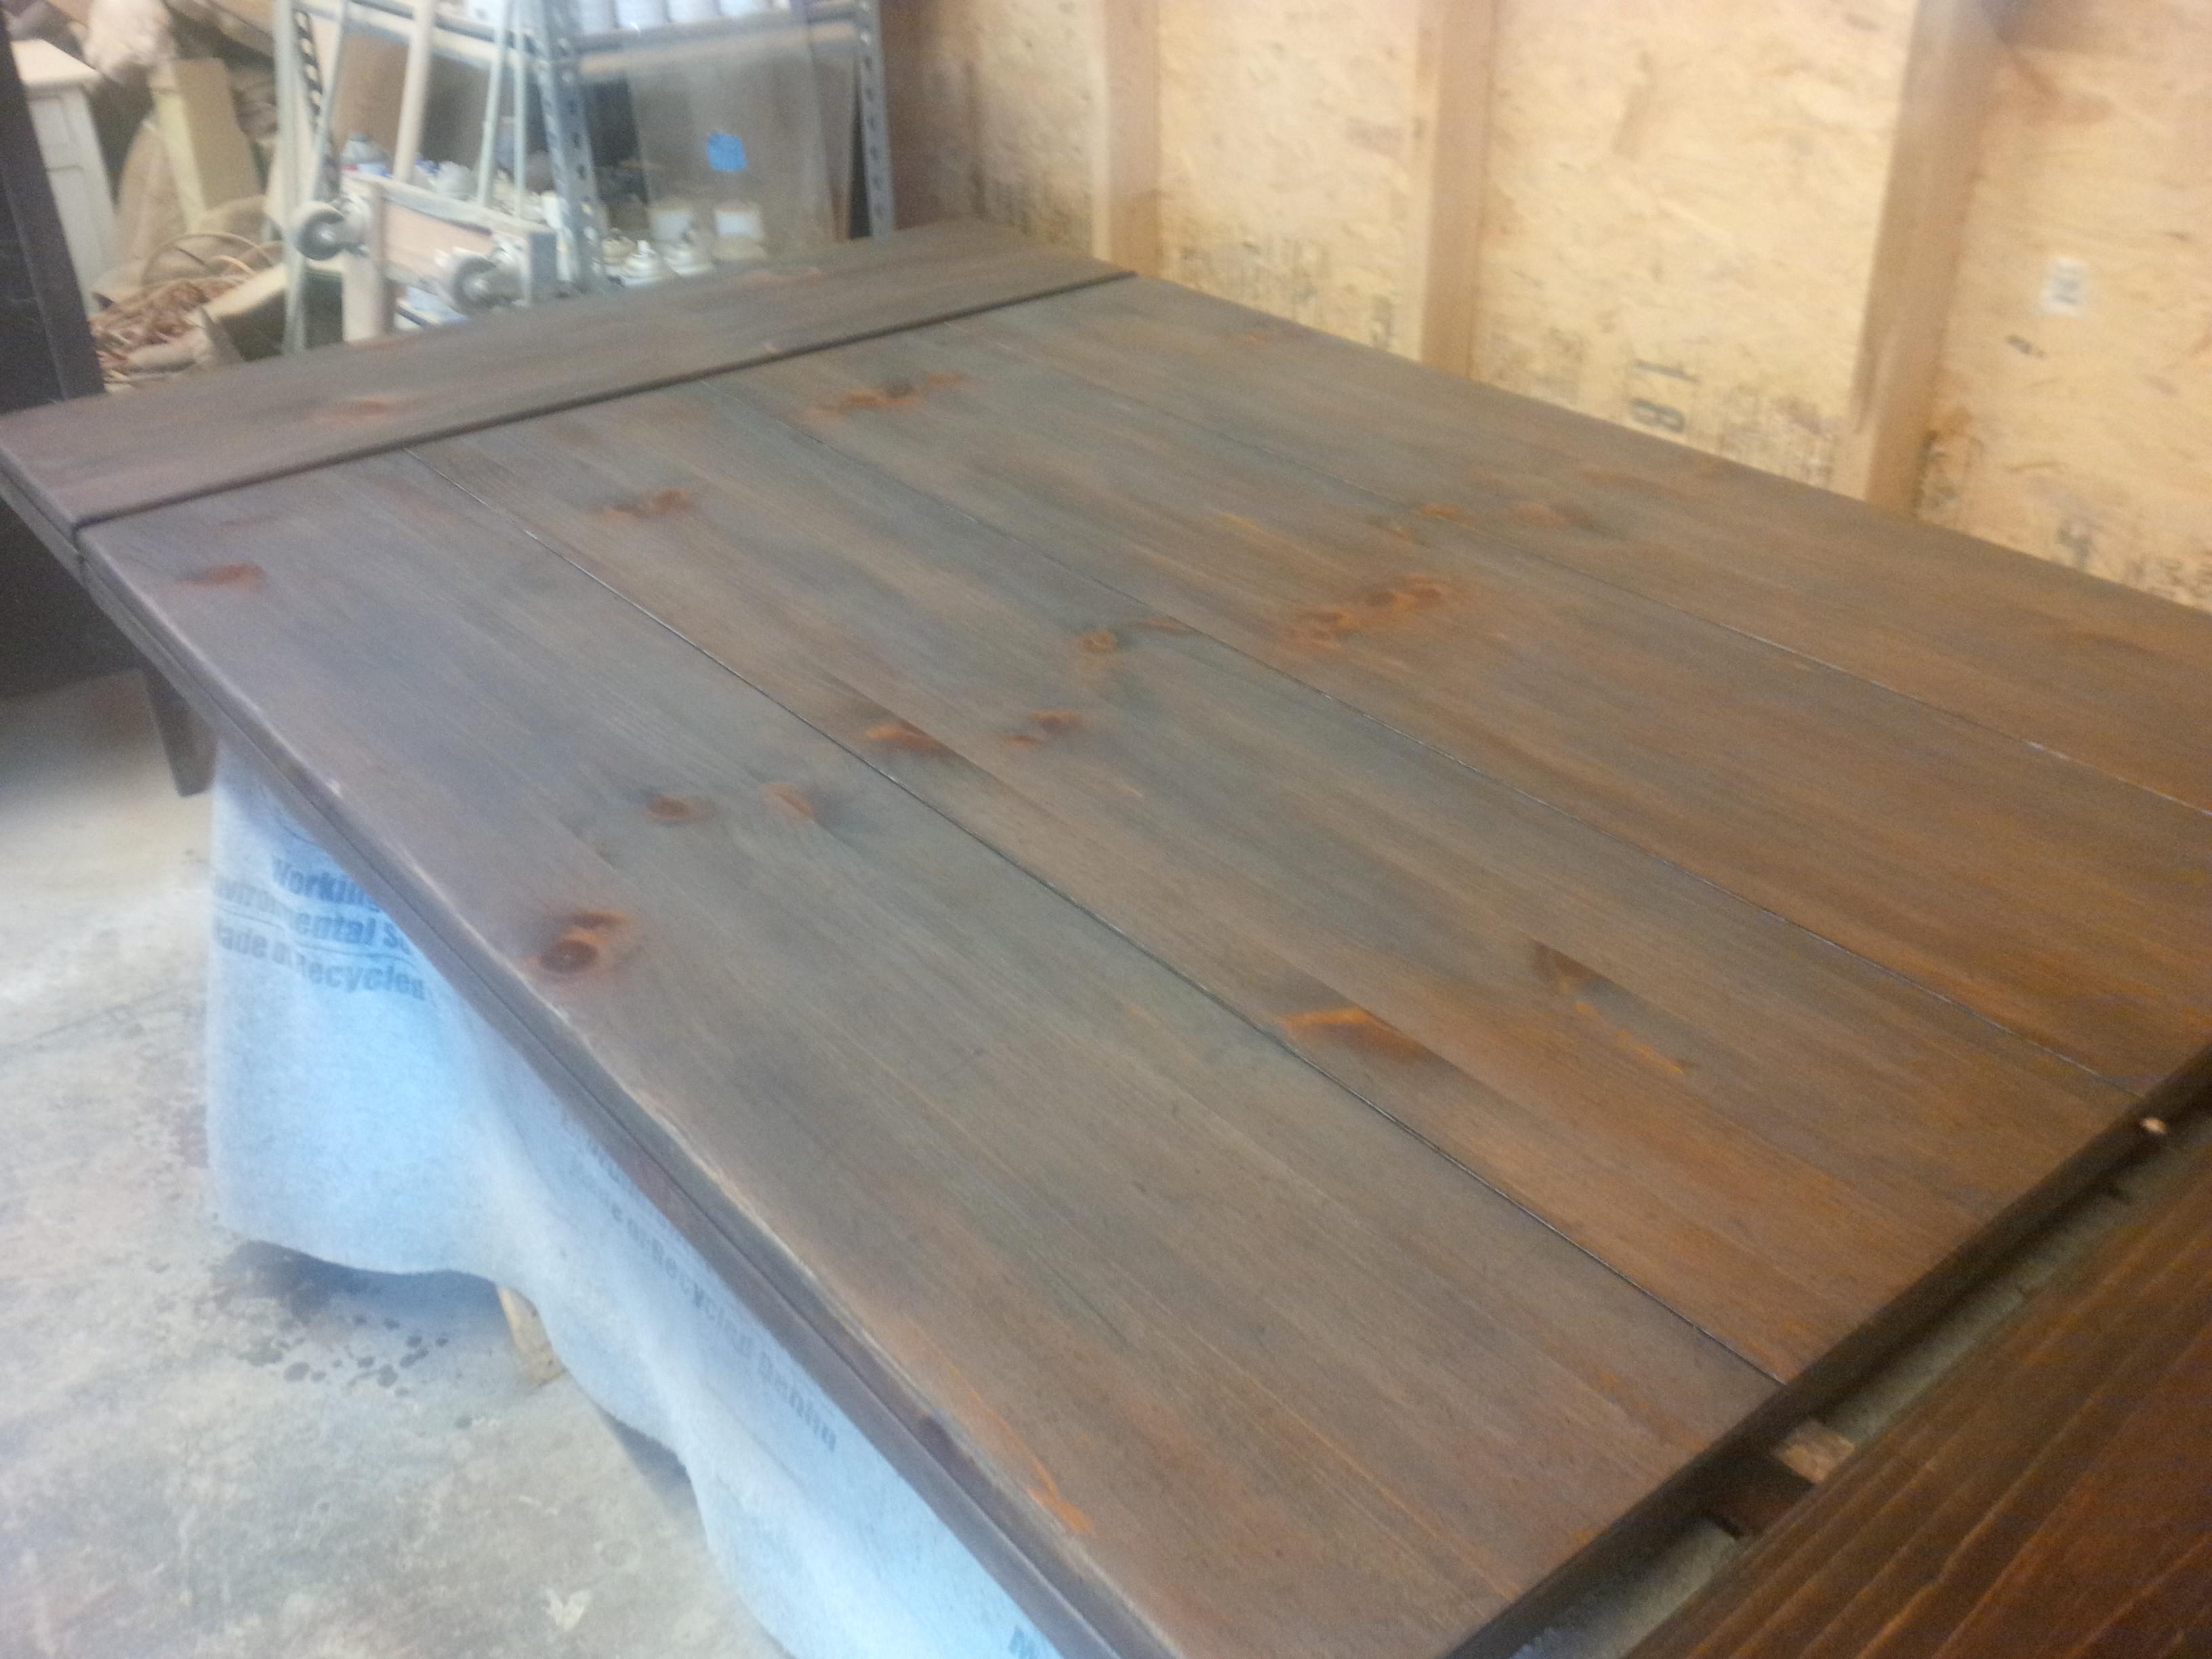 hardwood floor refinishing bucks county pa of furniture repair and refinishing penndel hardwood floor refinishing intended for img 20141020 110632